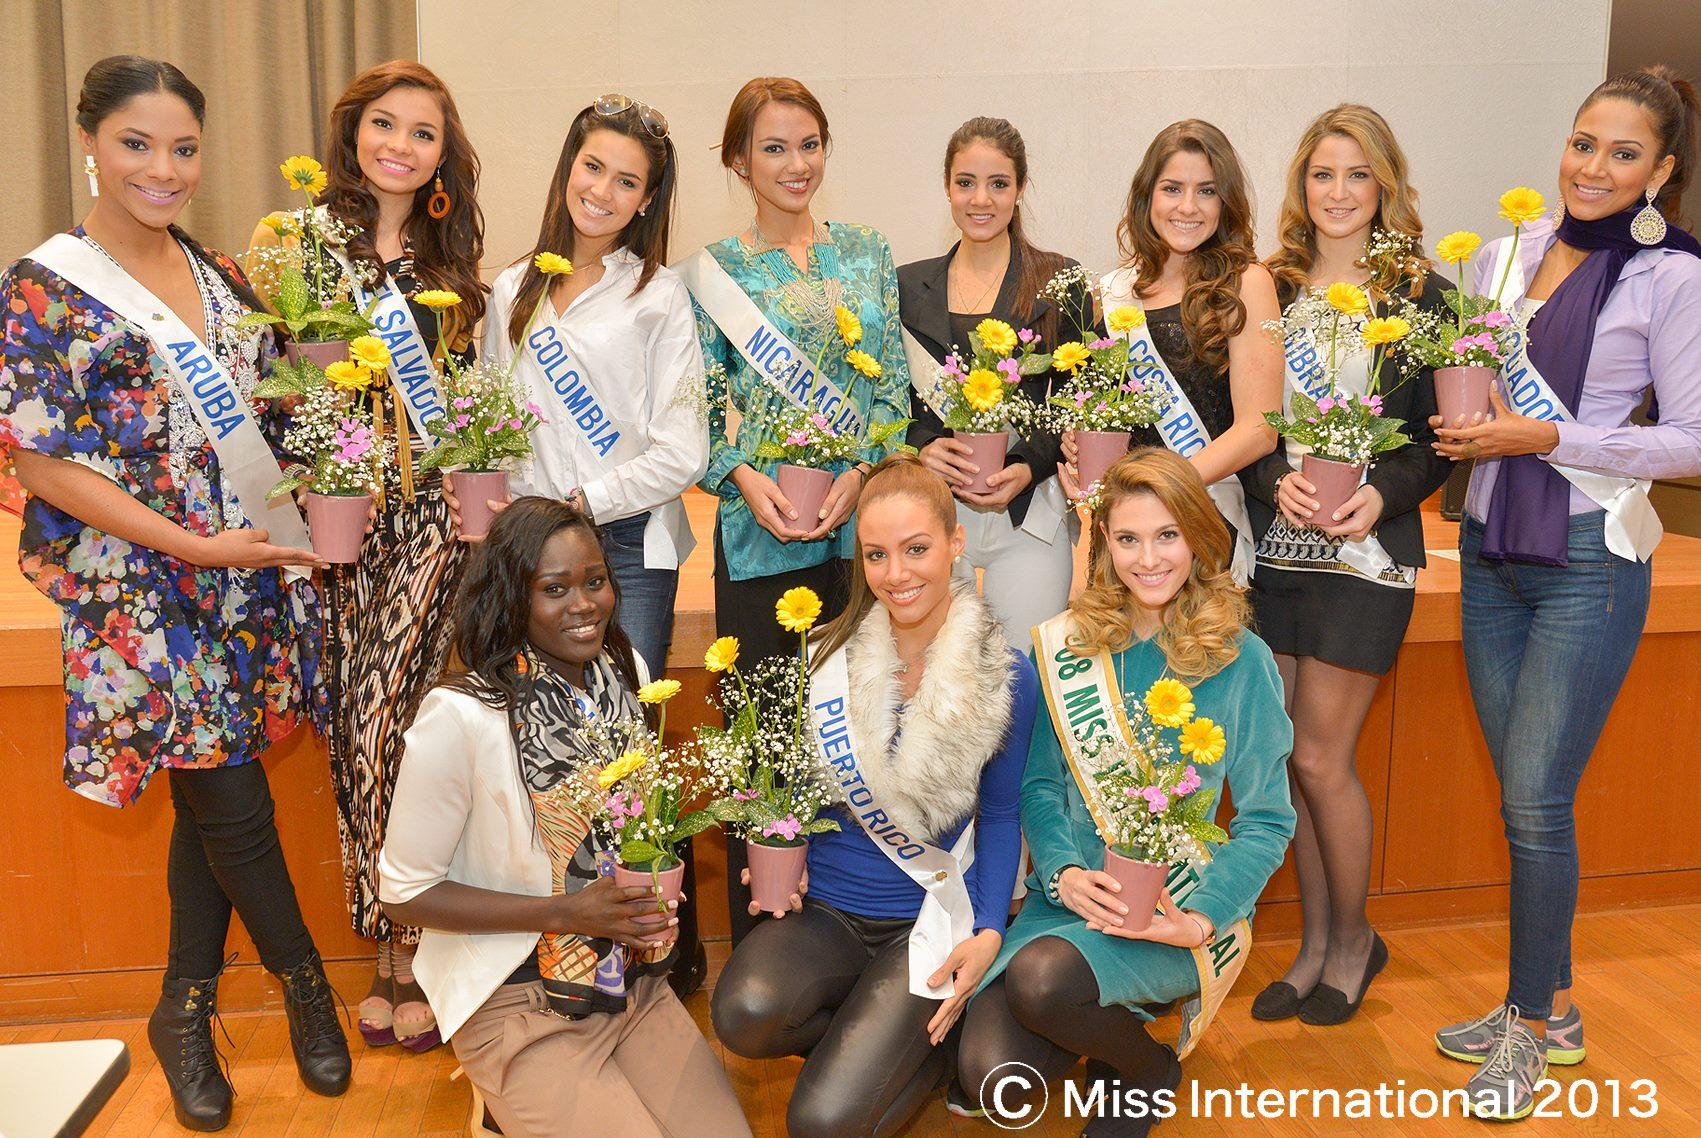 2013 Miss International Image